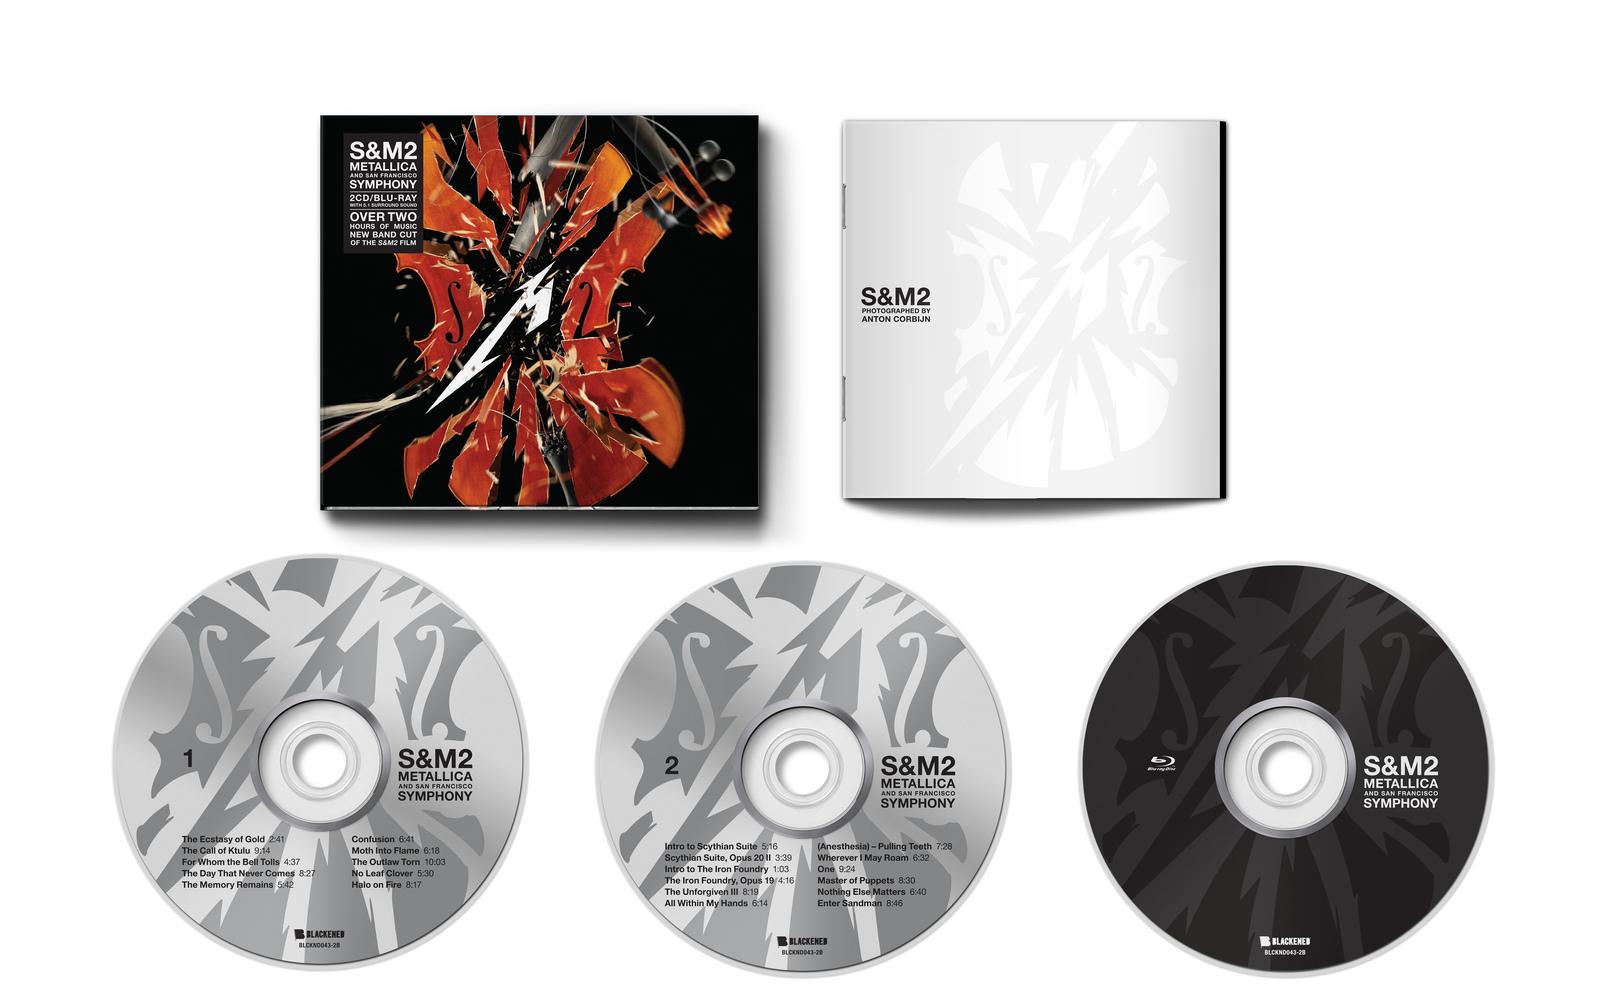 S&M2 (Blu-Ray/CD) by Metallica image